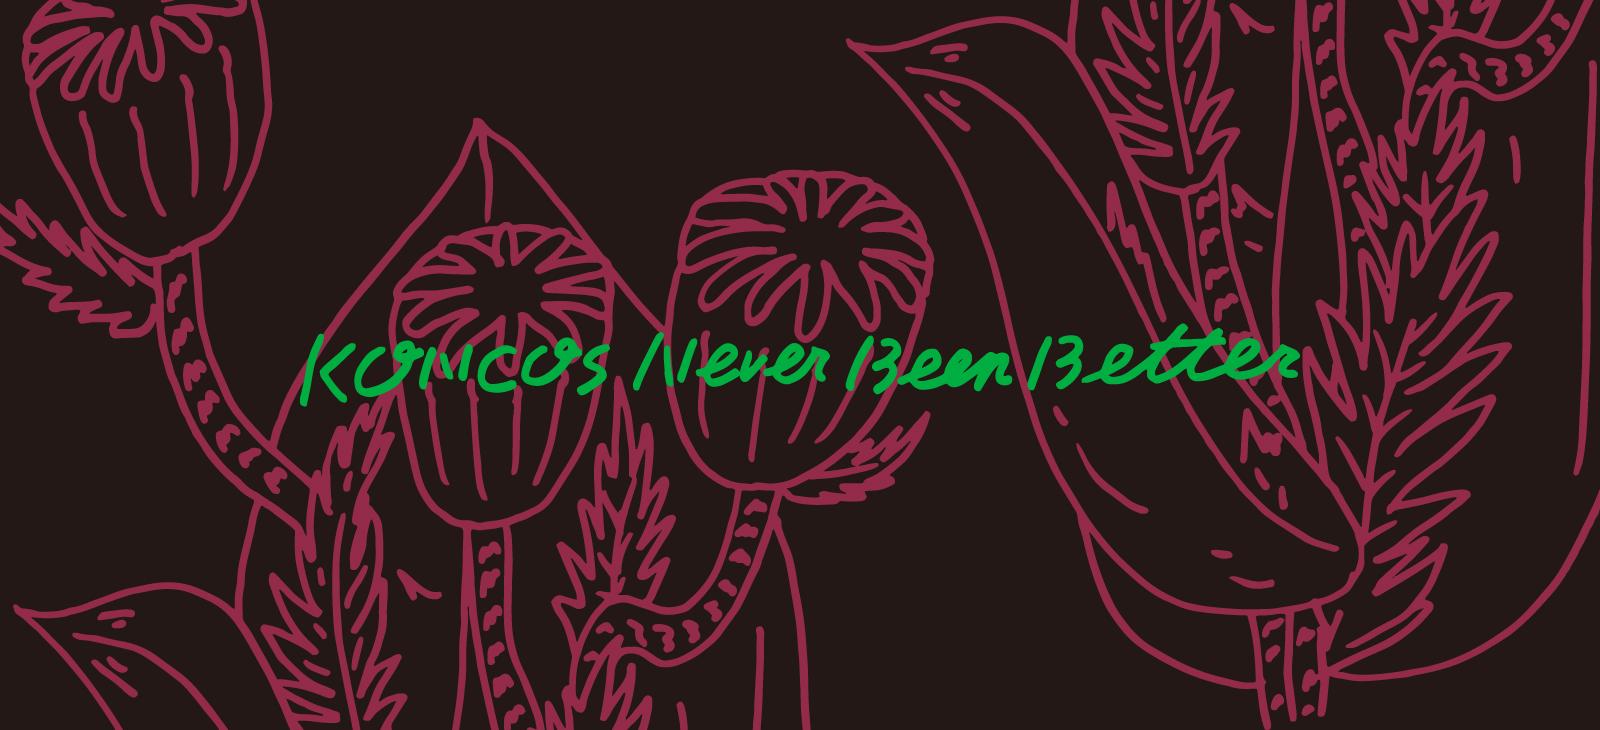 KONCOS | Never Been Better